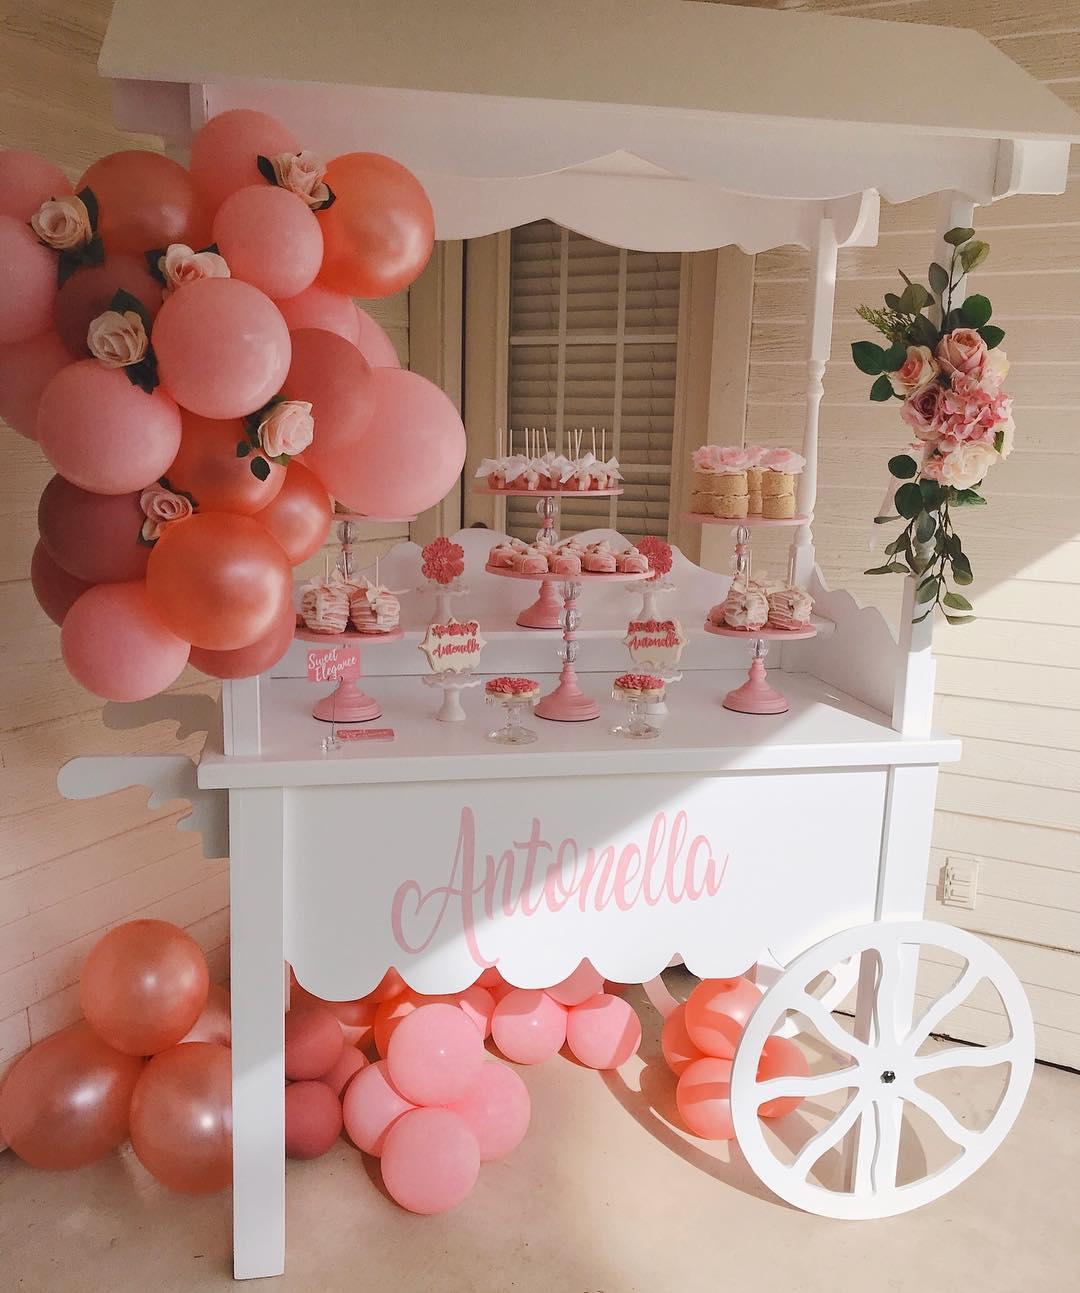 opulent treasures pink cake stands.jpg